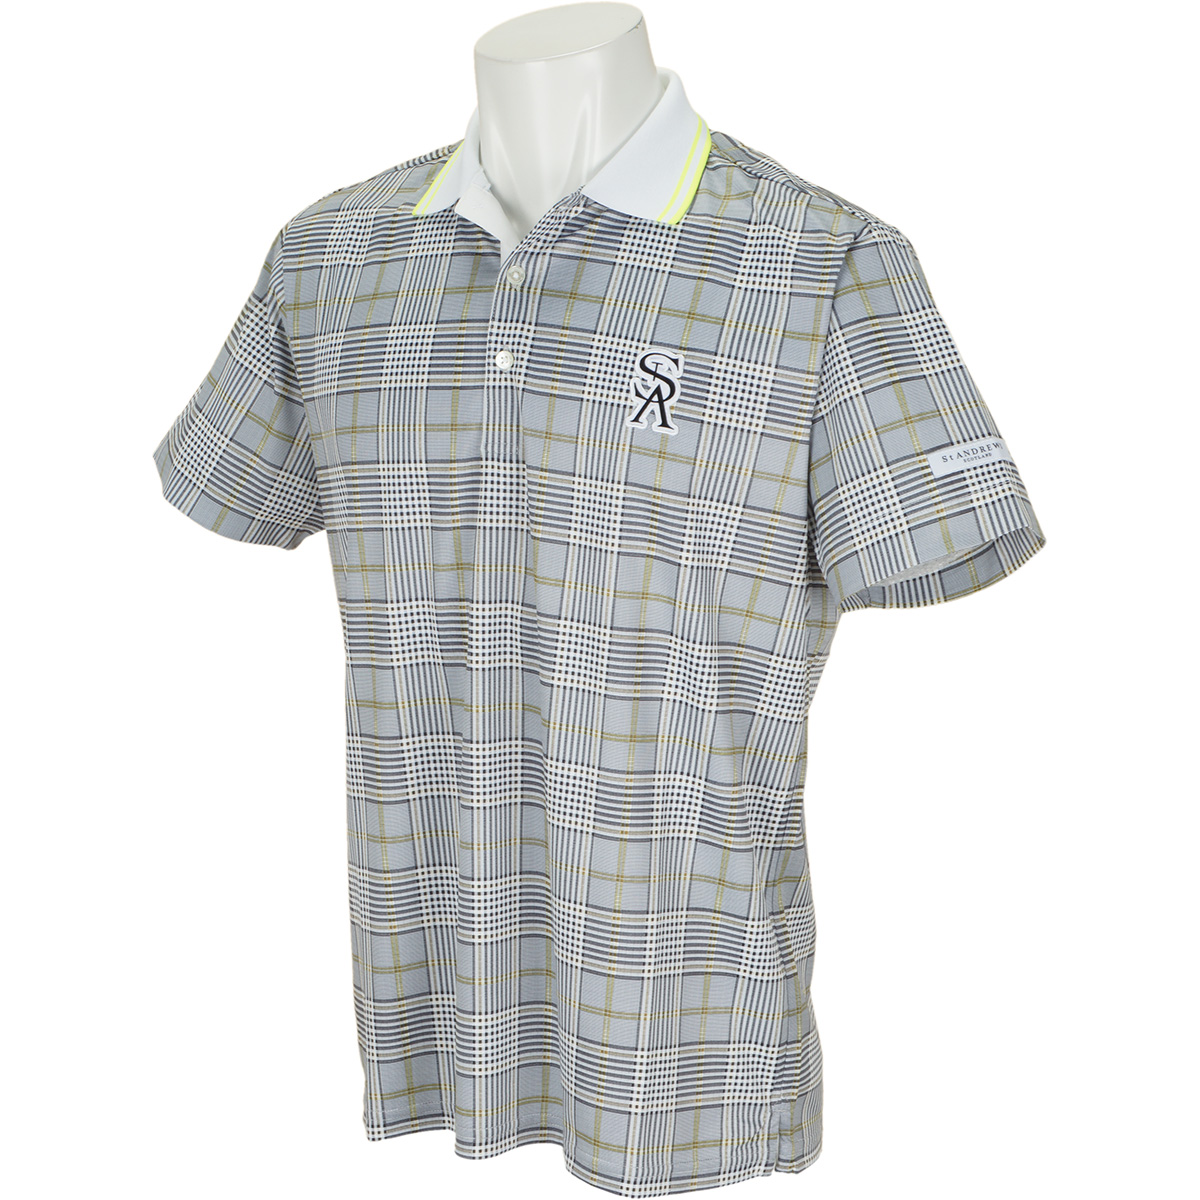 Uchimizuグレンチェックプリント半袖ポロシャツ